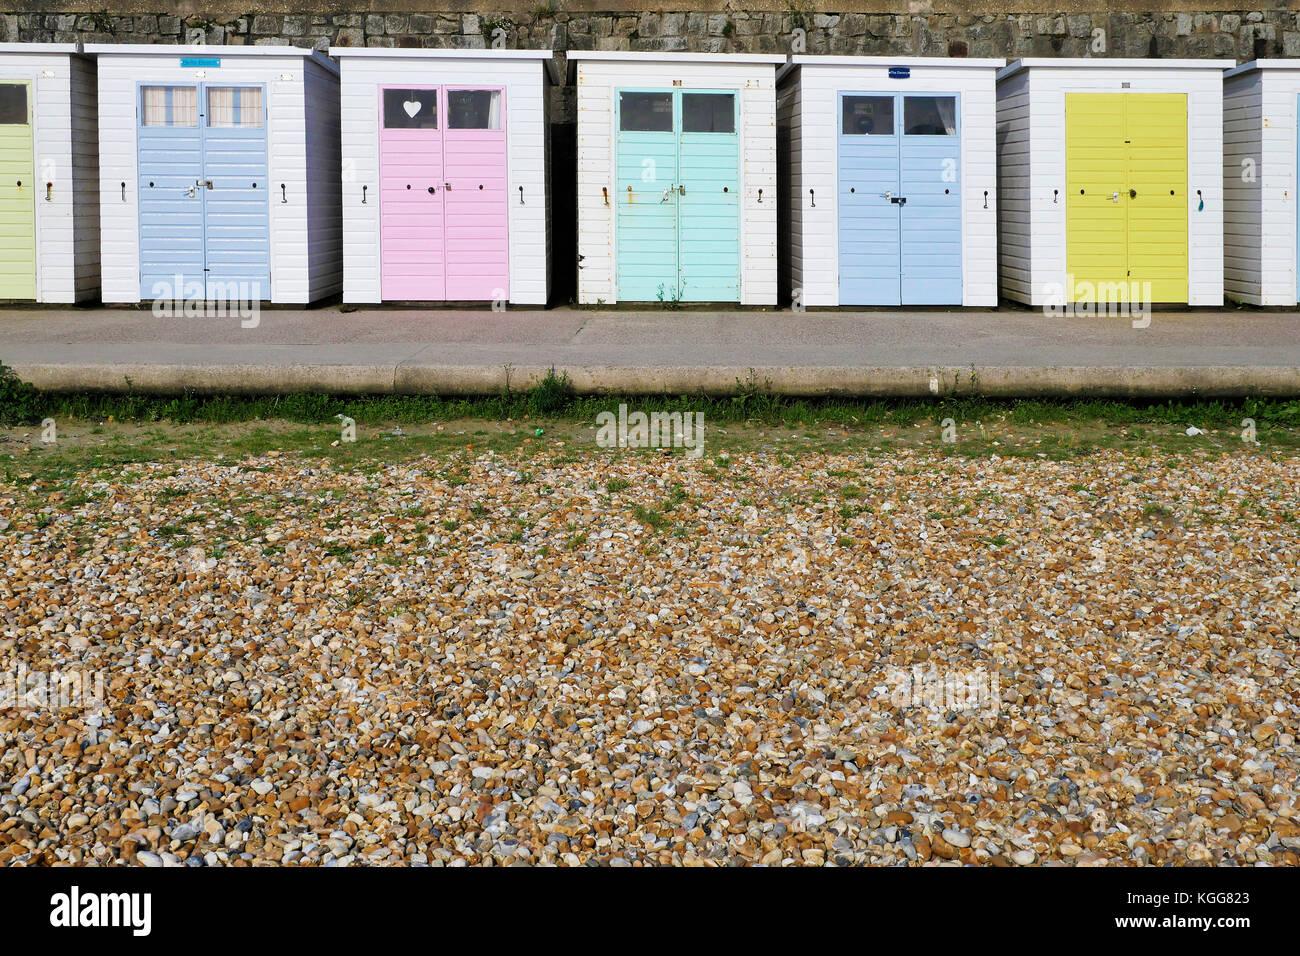 Row of beach huts at Lyme Regis in Dorset. - Stock Image